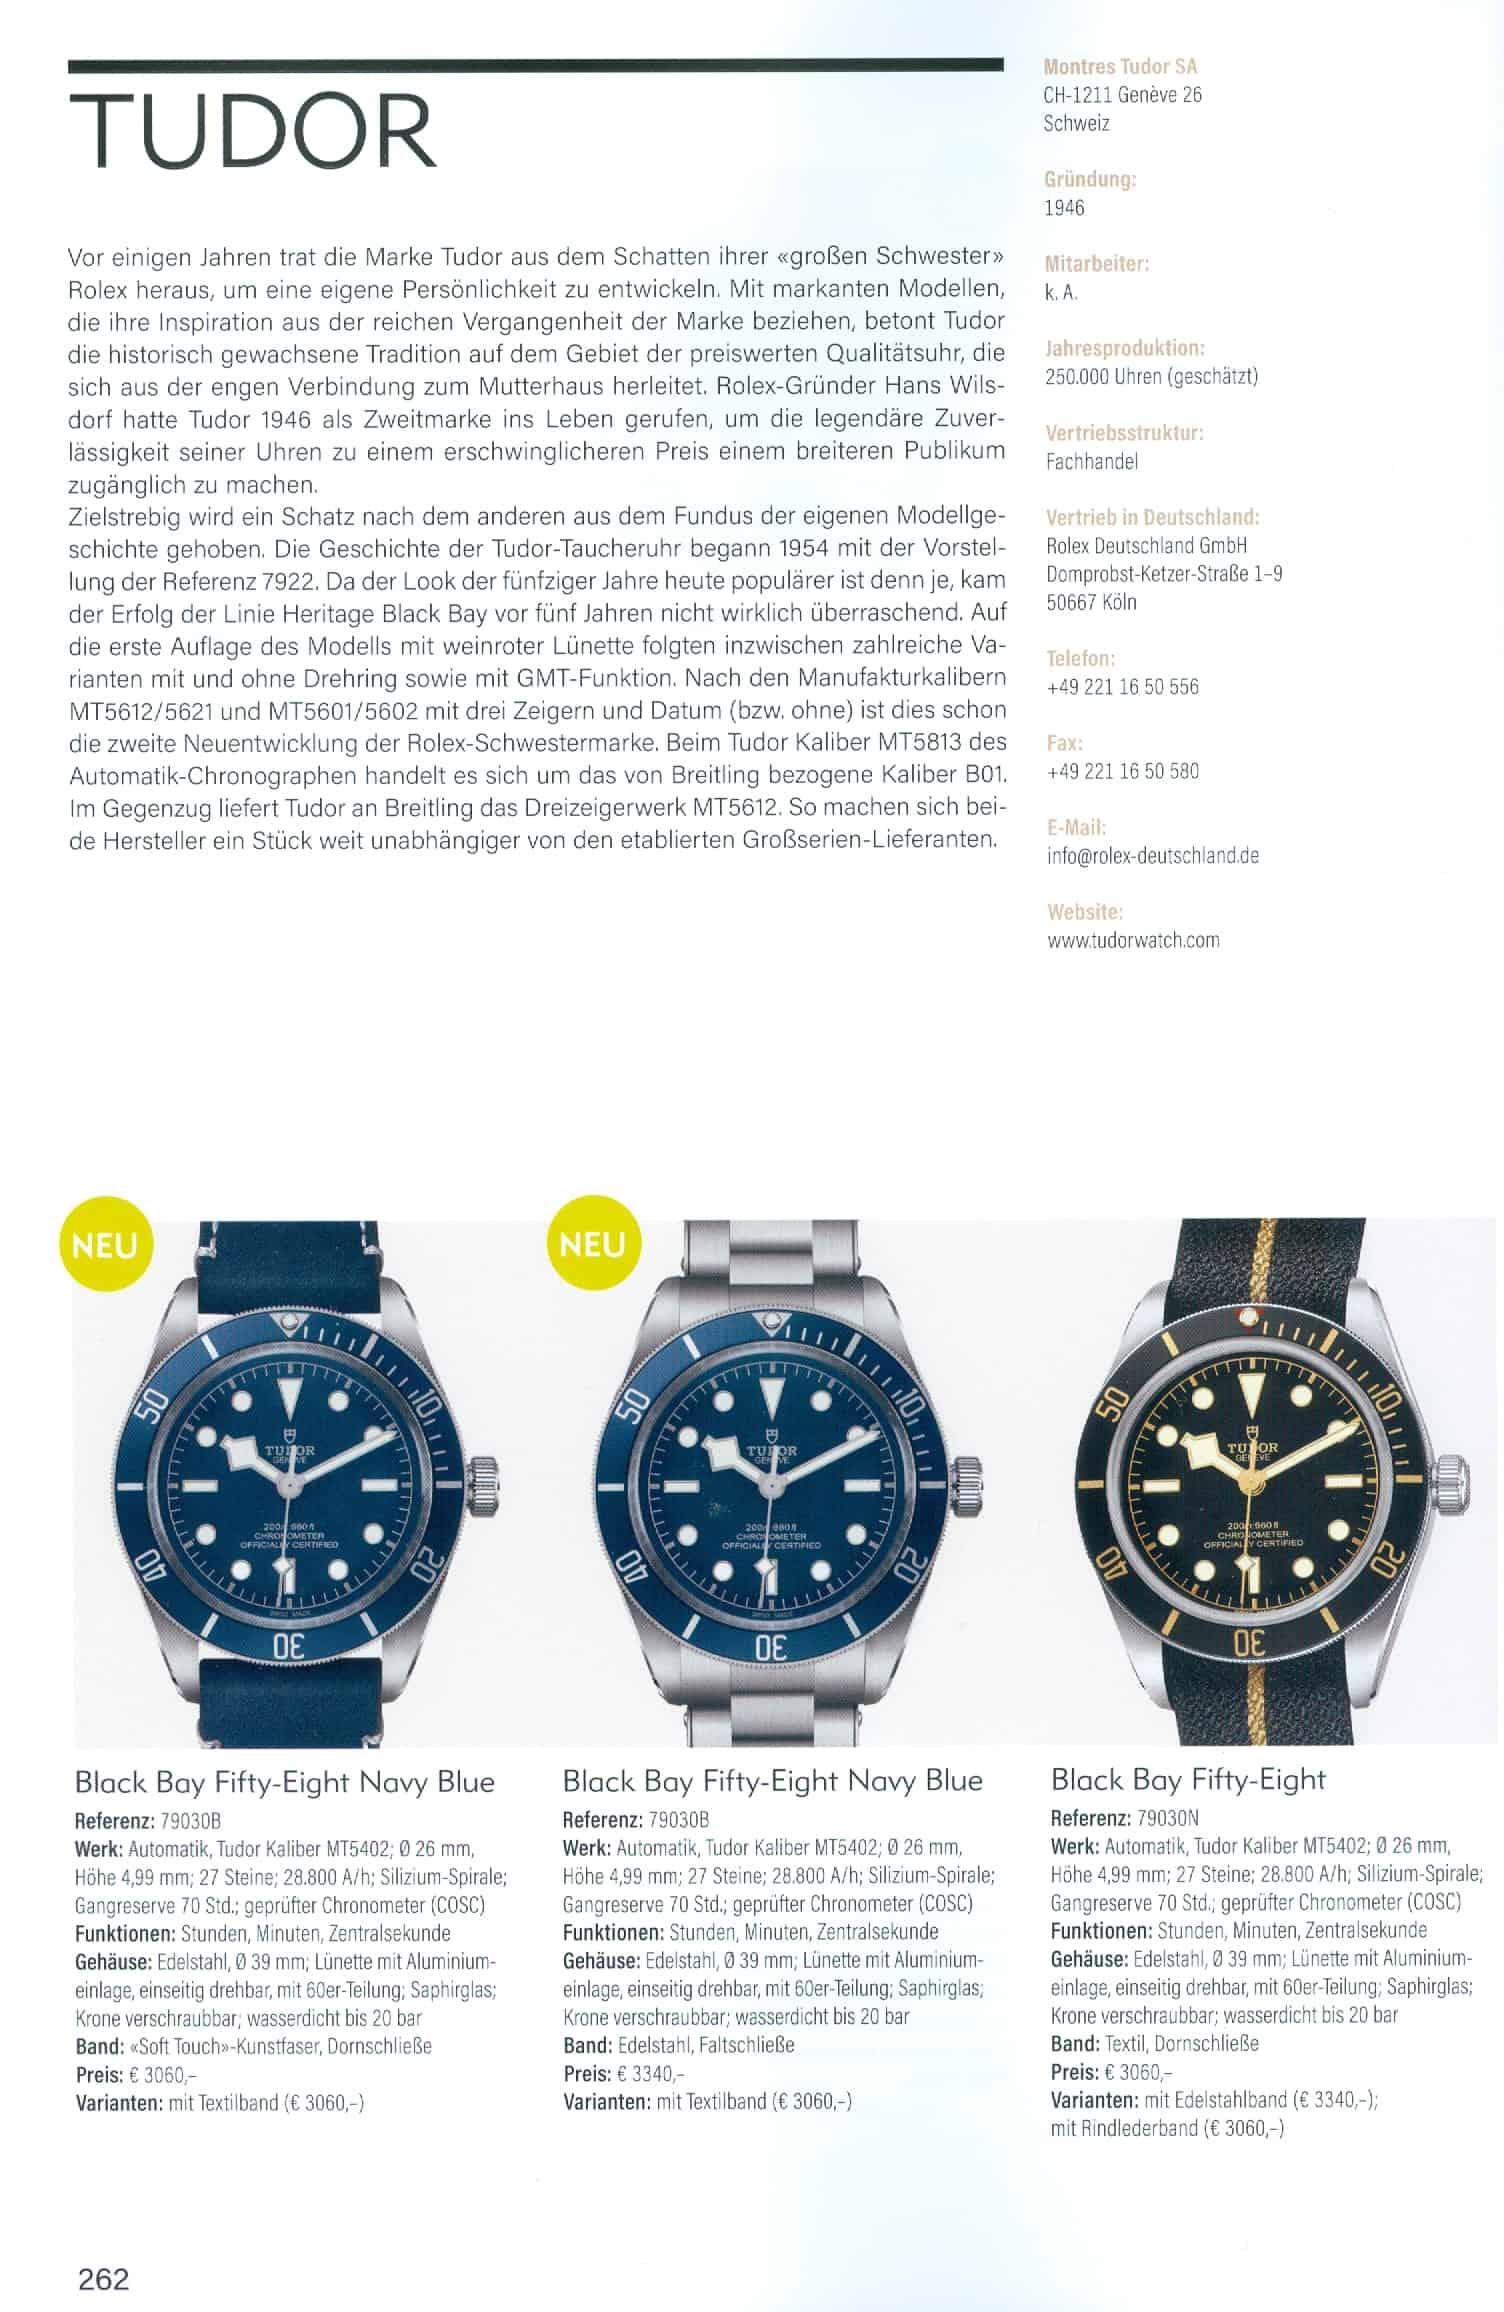 Armbanduhren Katalog Heel Verlag 2020 2021 Tudor